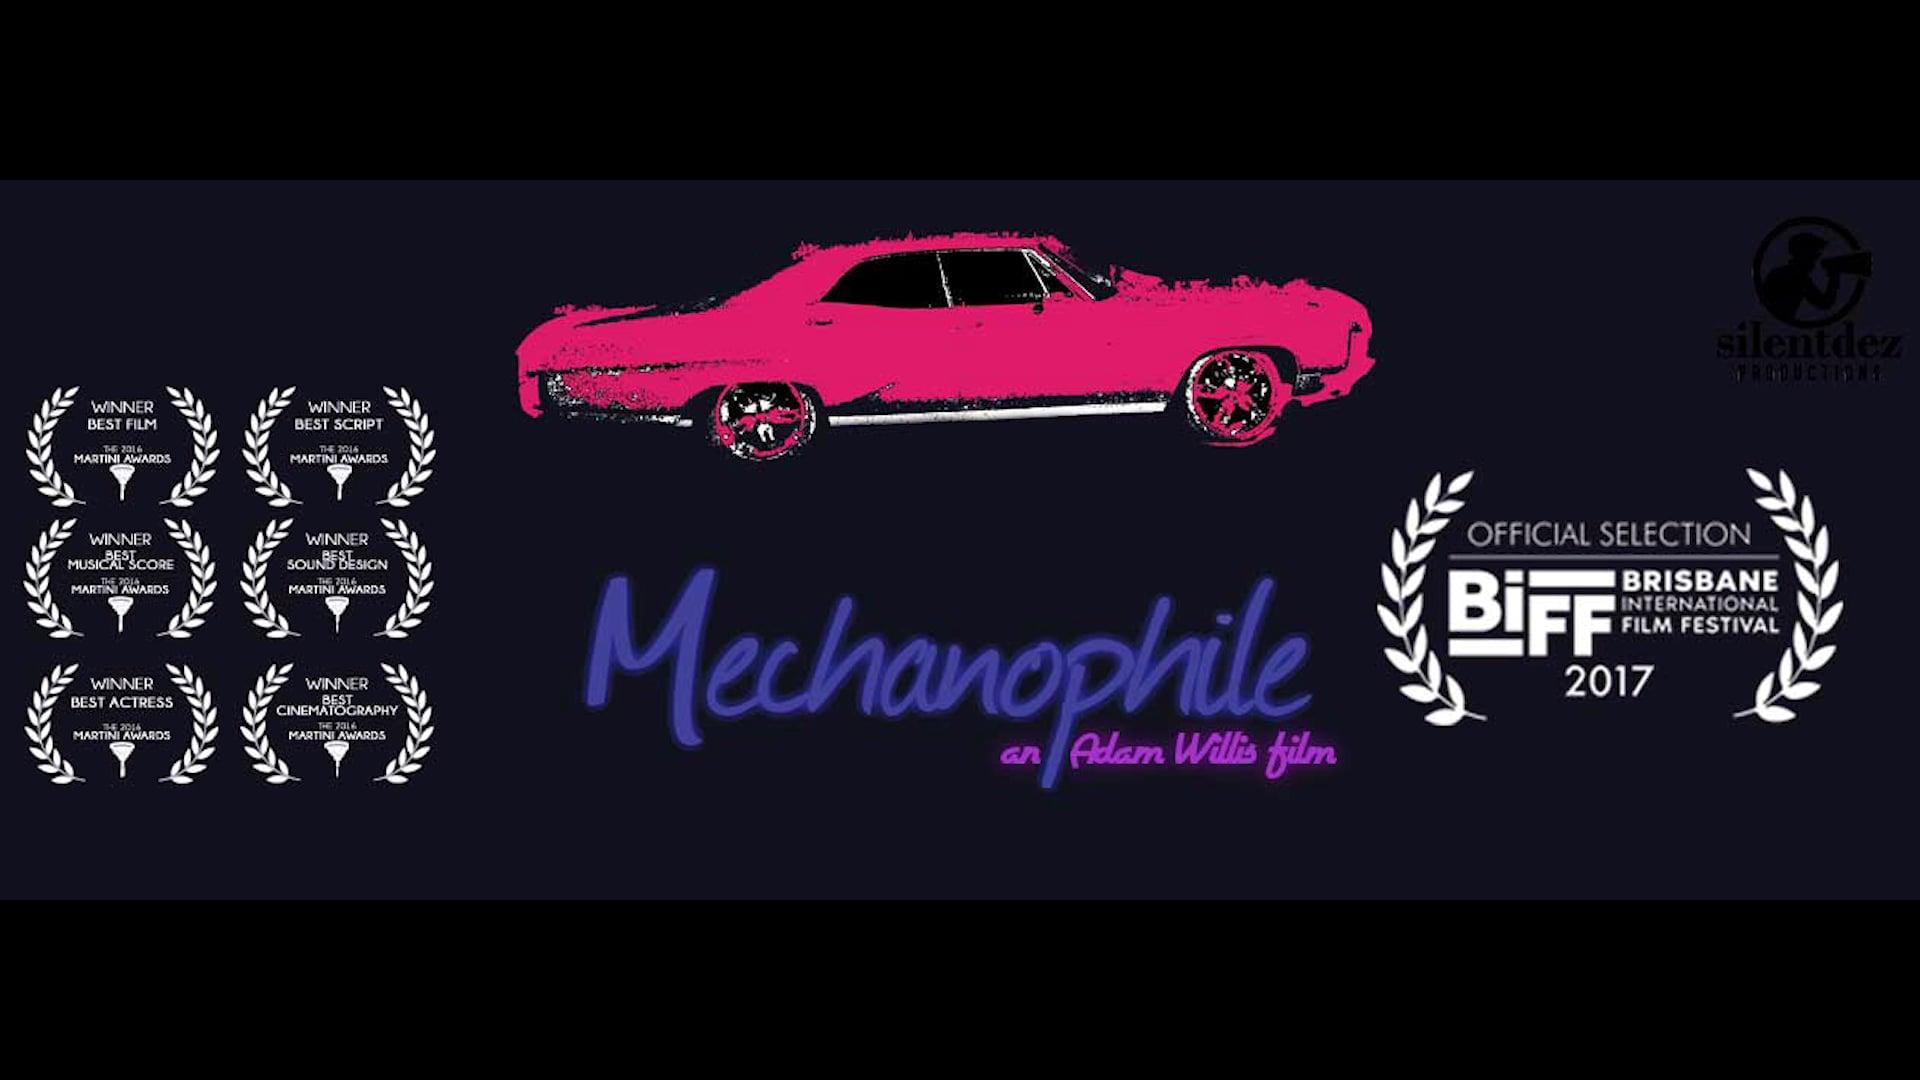 Mechanophile [2017]